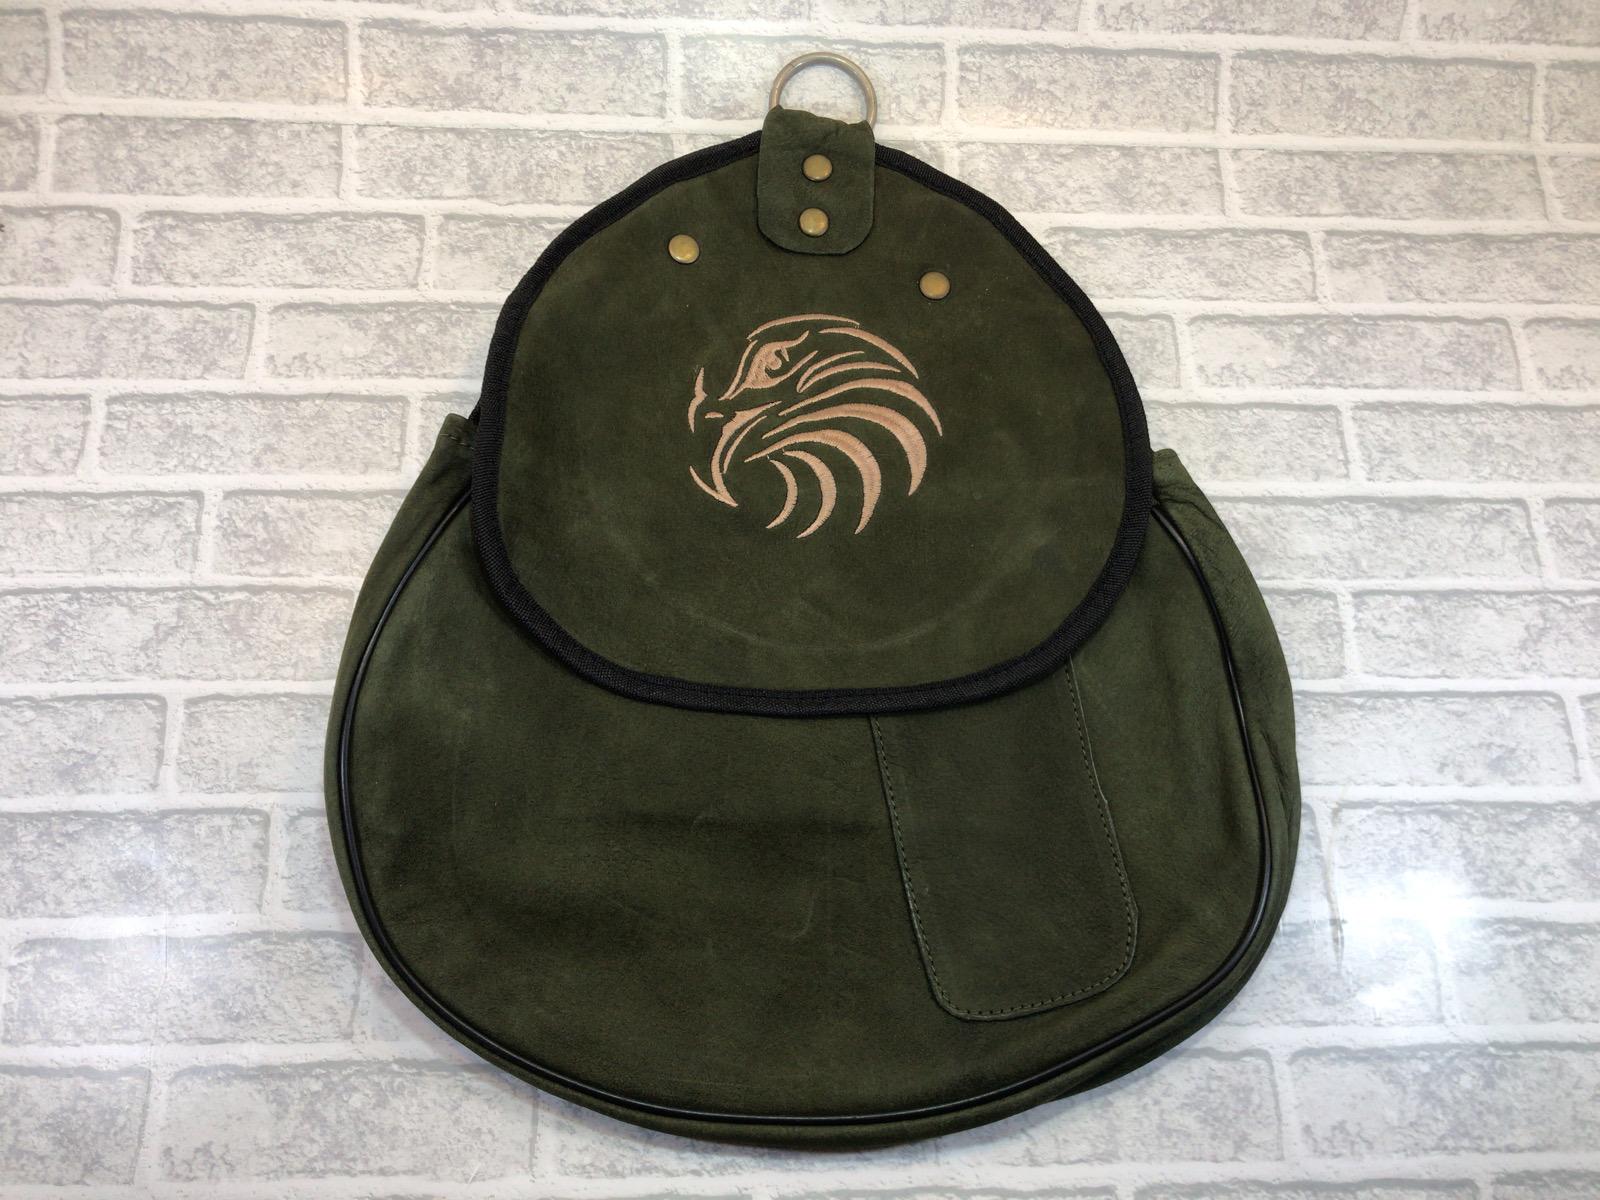 HAWKING BAG ホーキングバッグ レザー イーグル刺繍